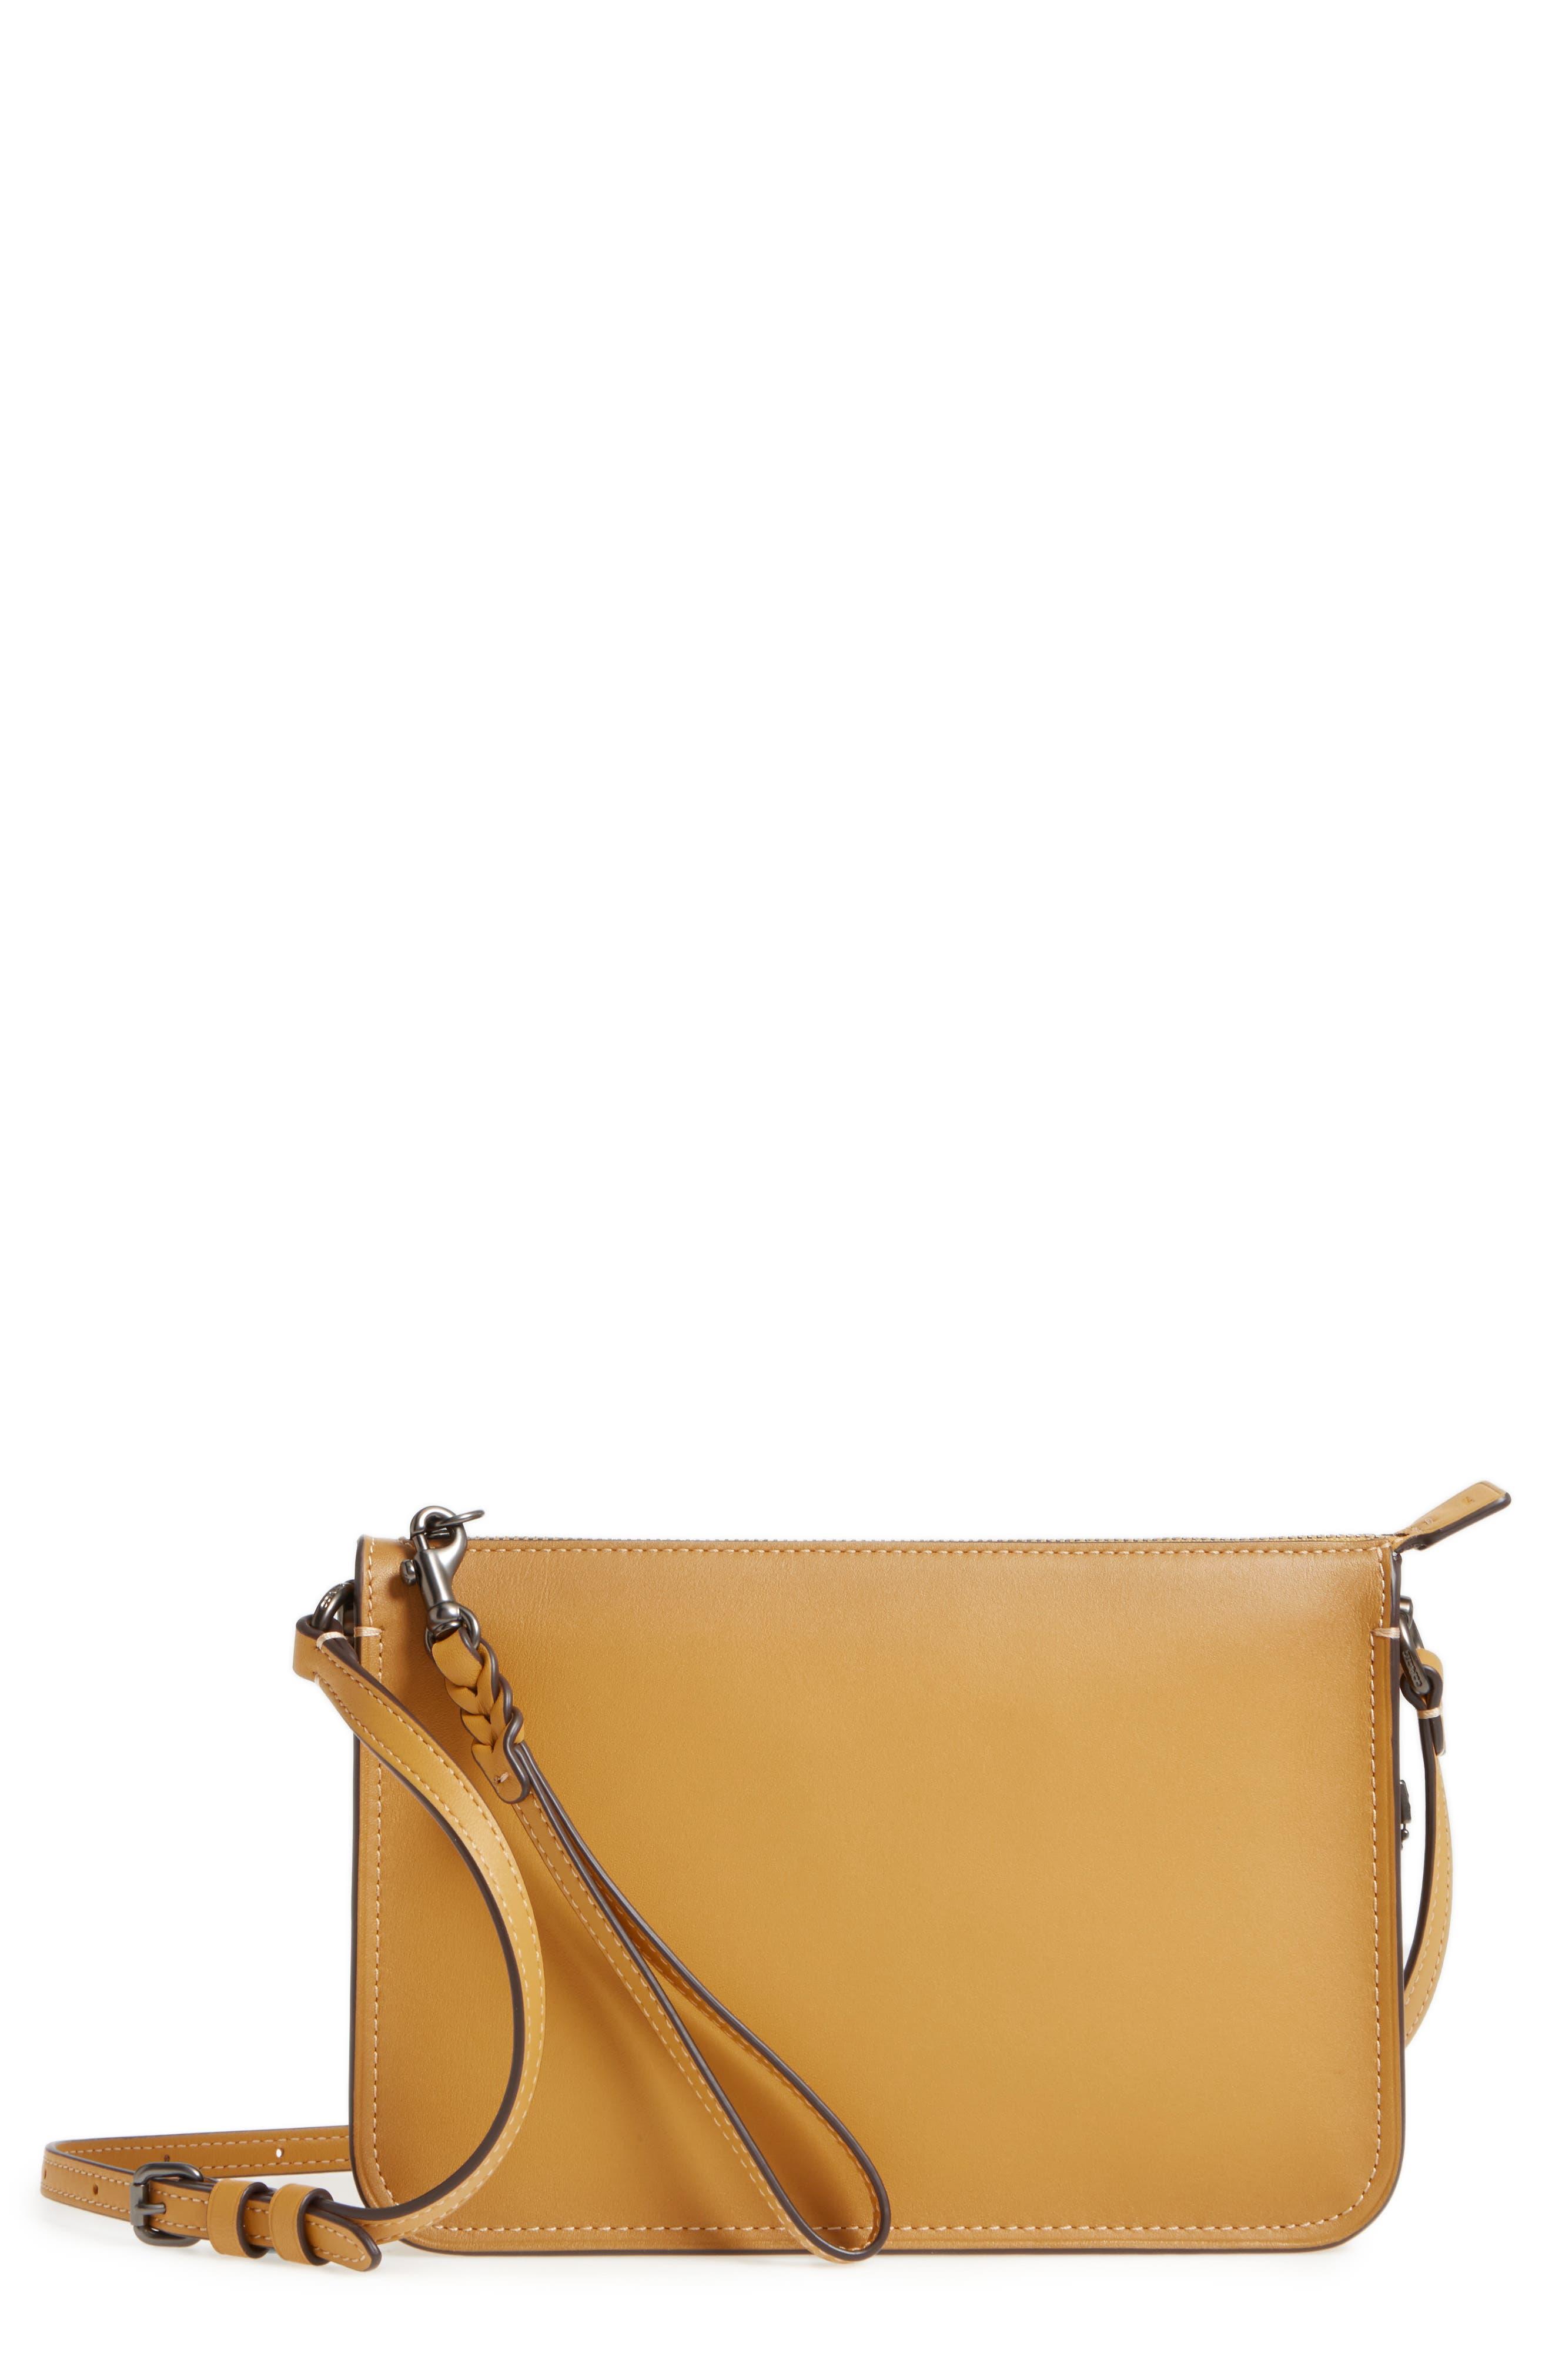 Main Image - COACH 1941 Soho Leather Crossbody Bag